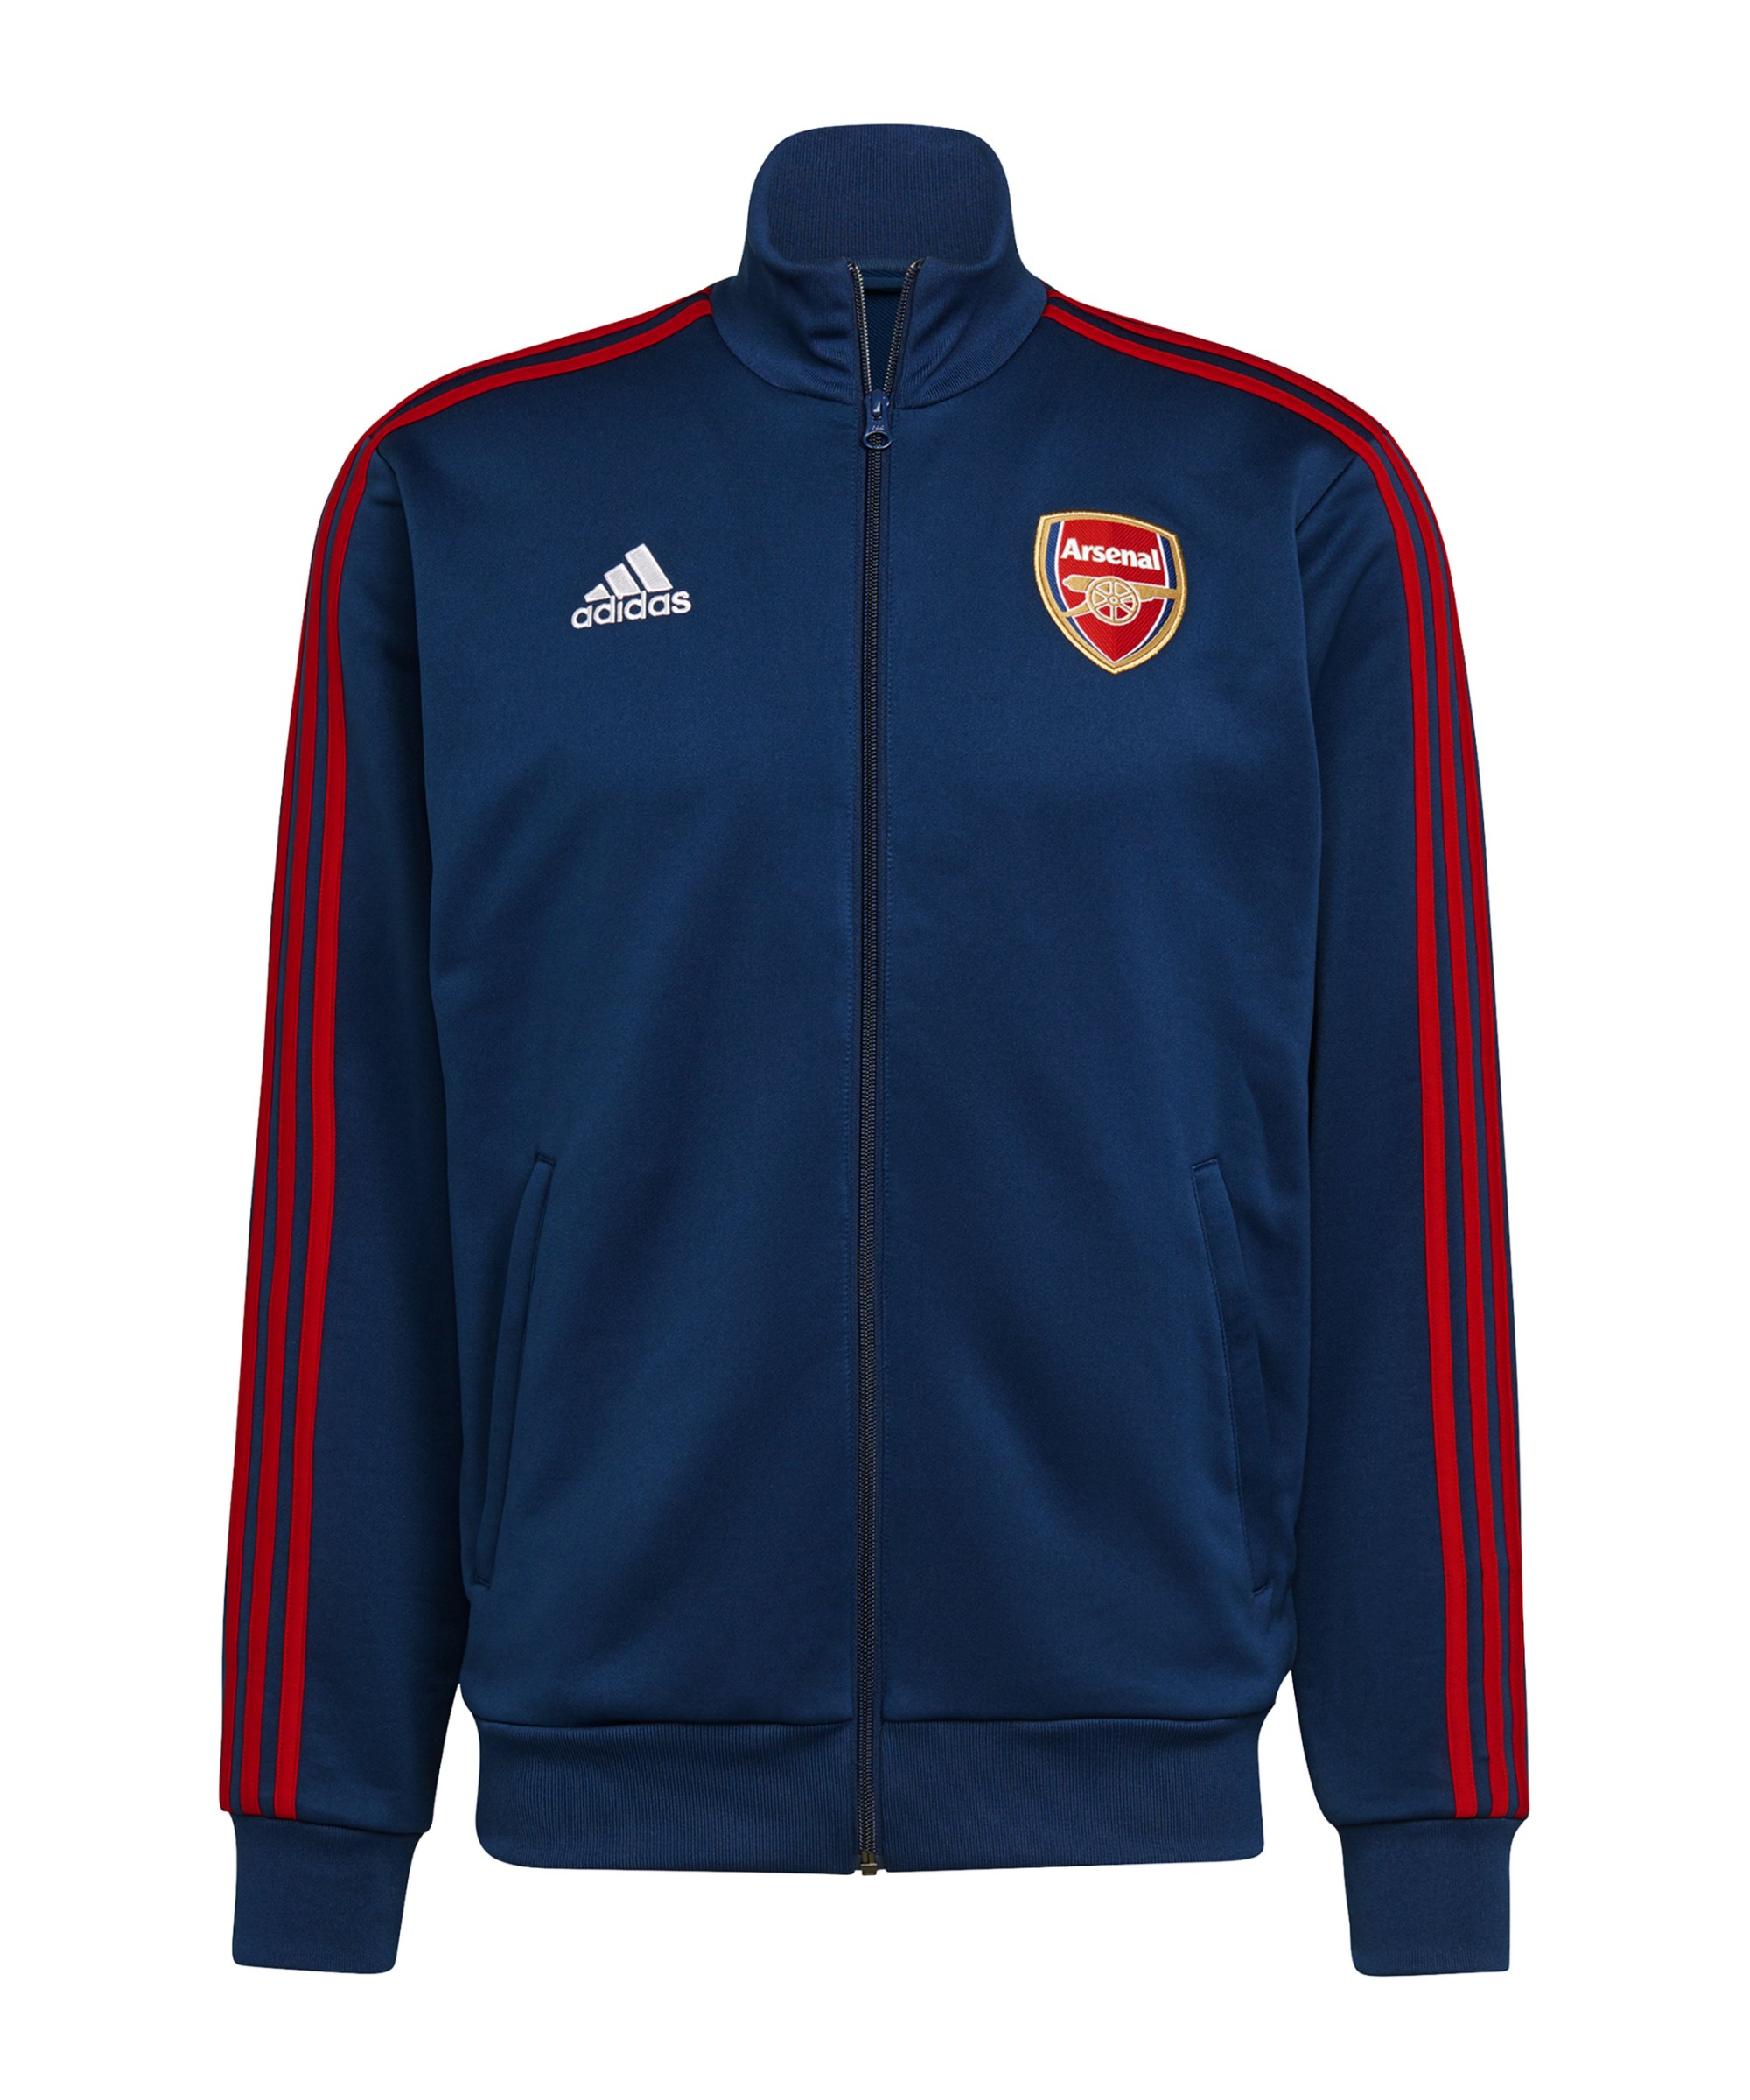 adidas FC Arsenal London 3S Tracktop Jacke Blau - blau